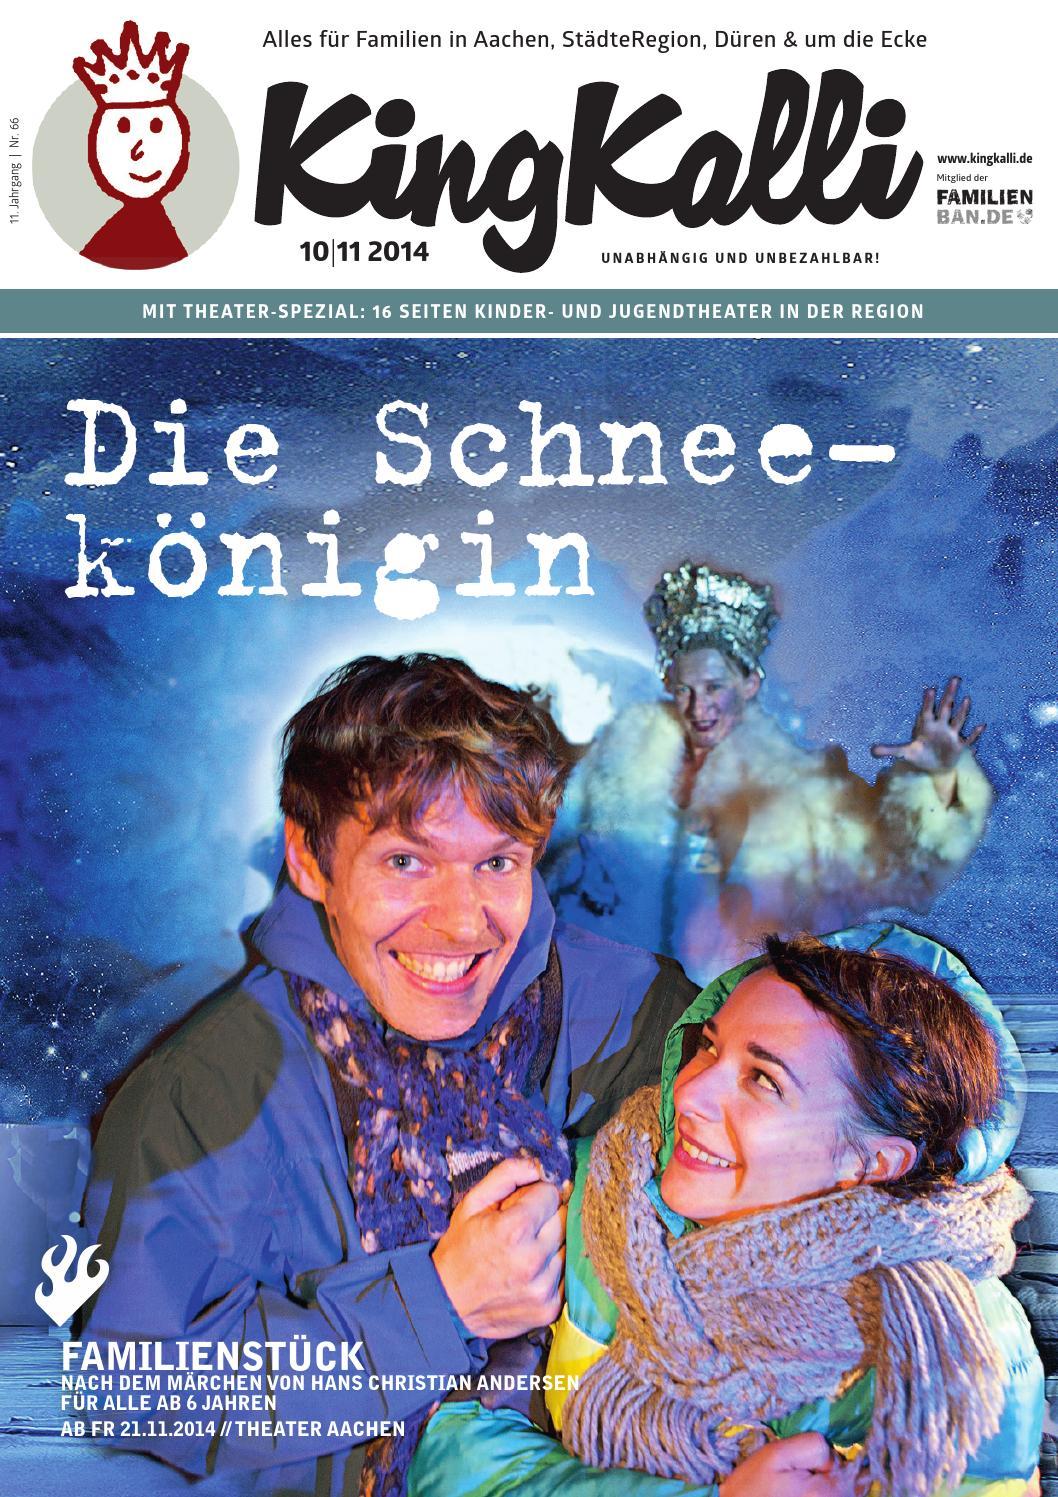 KingKalli66 Oktober/November 2014 by Verlag um die Ecke - issuu